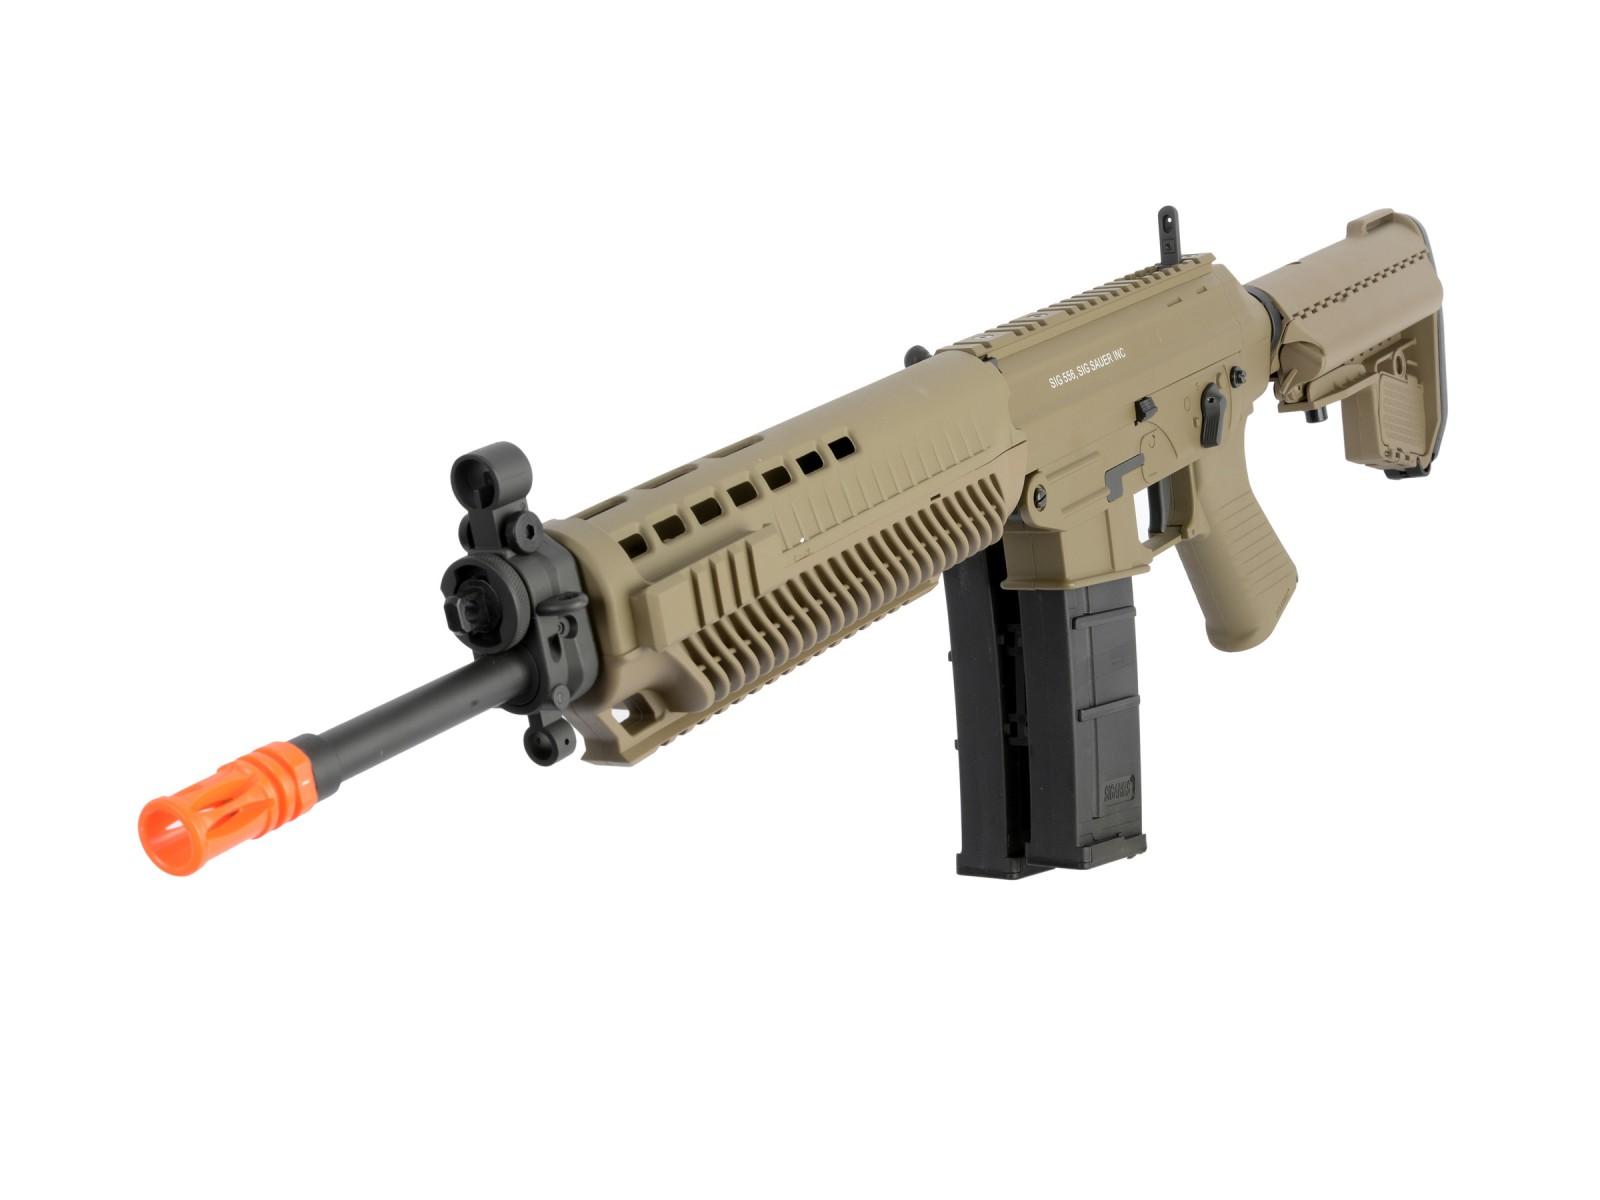 sig sauer sig sauer 556 full metal aeg airsoft rifle tan airsoft guns rh pyramydair com sig 556 manual pdf sig sauer 556 manual